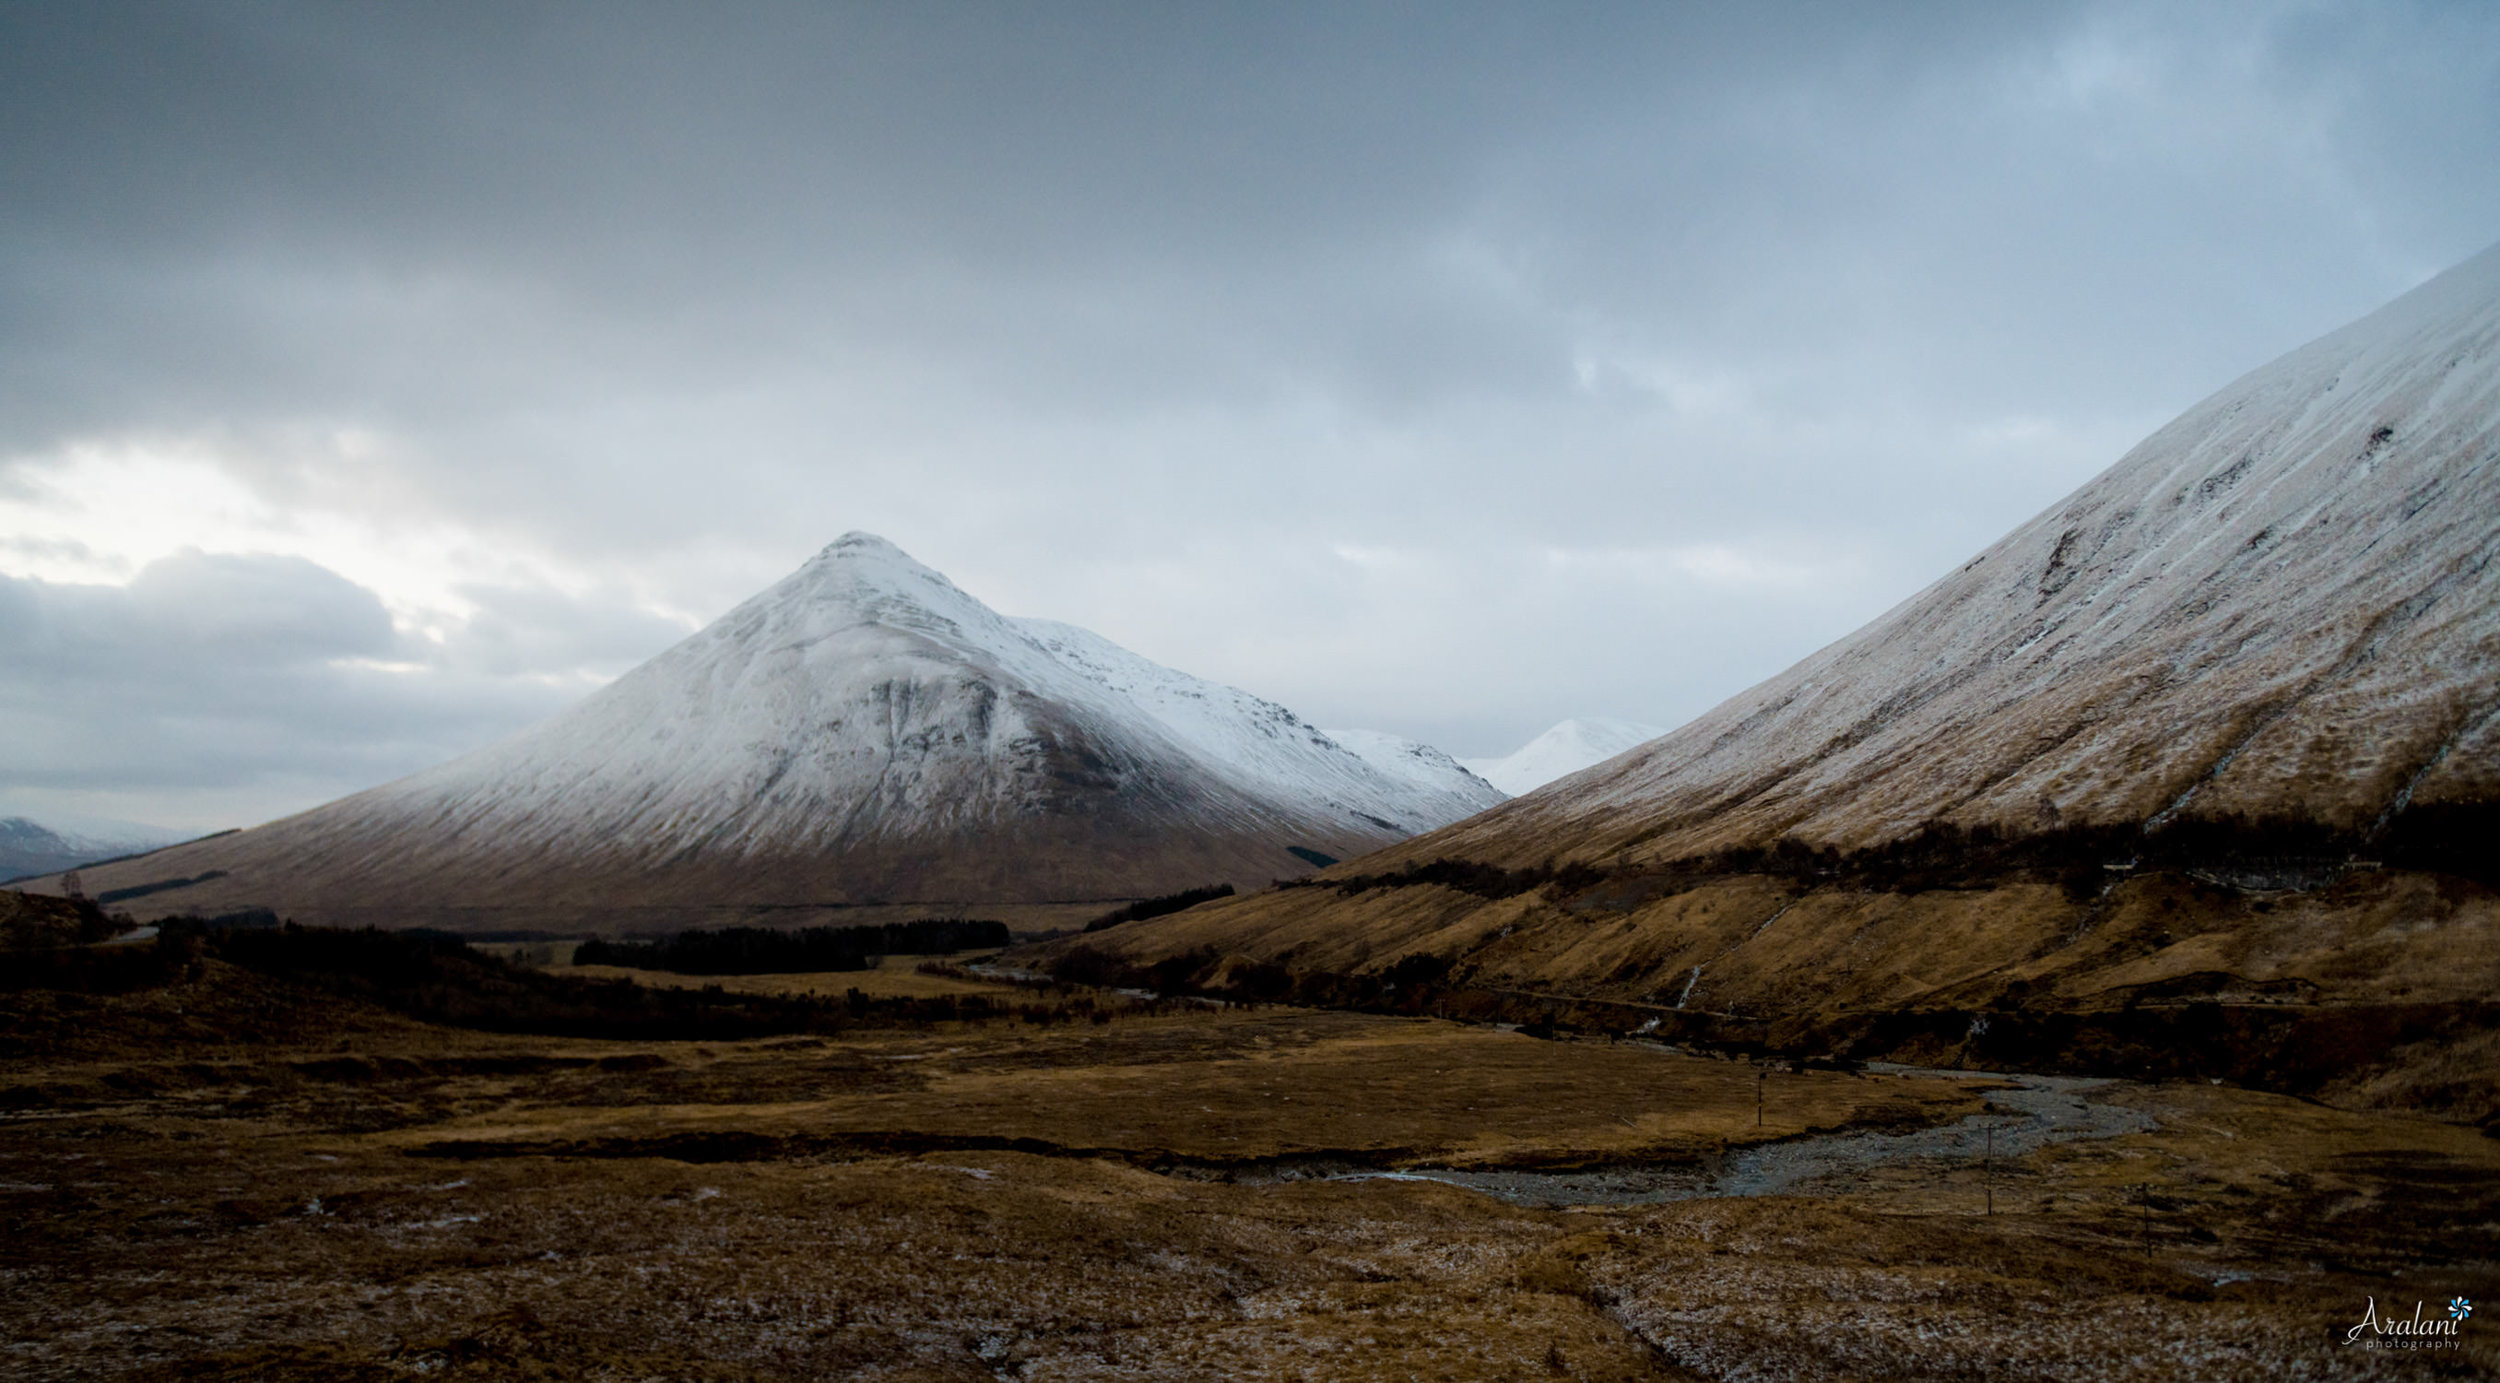 Aralani_Scotland_0059.jpg